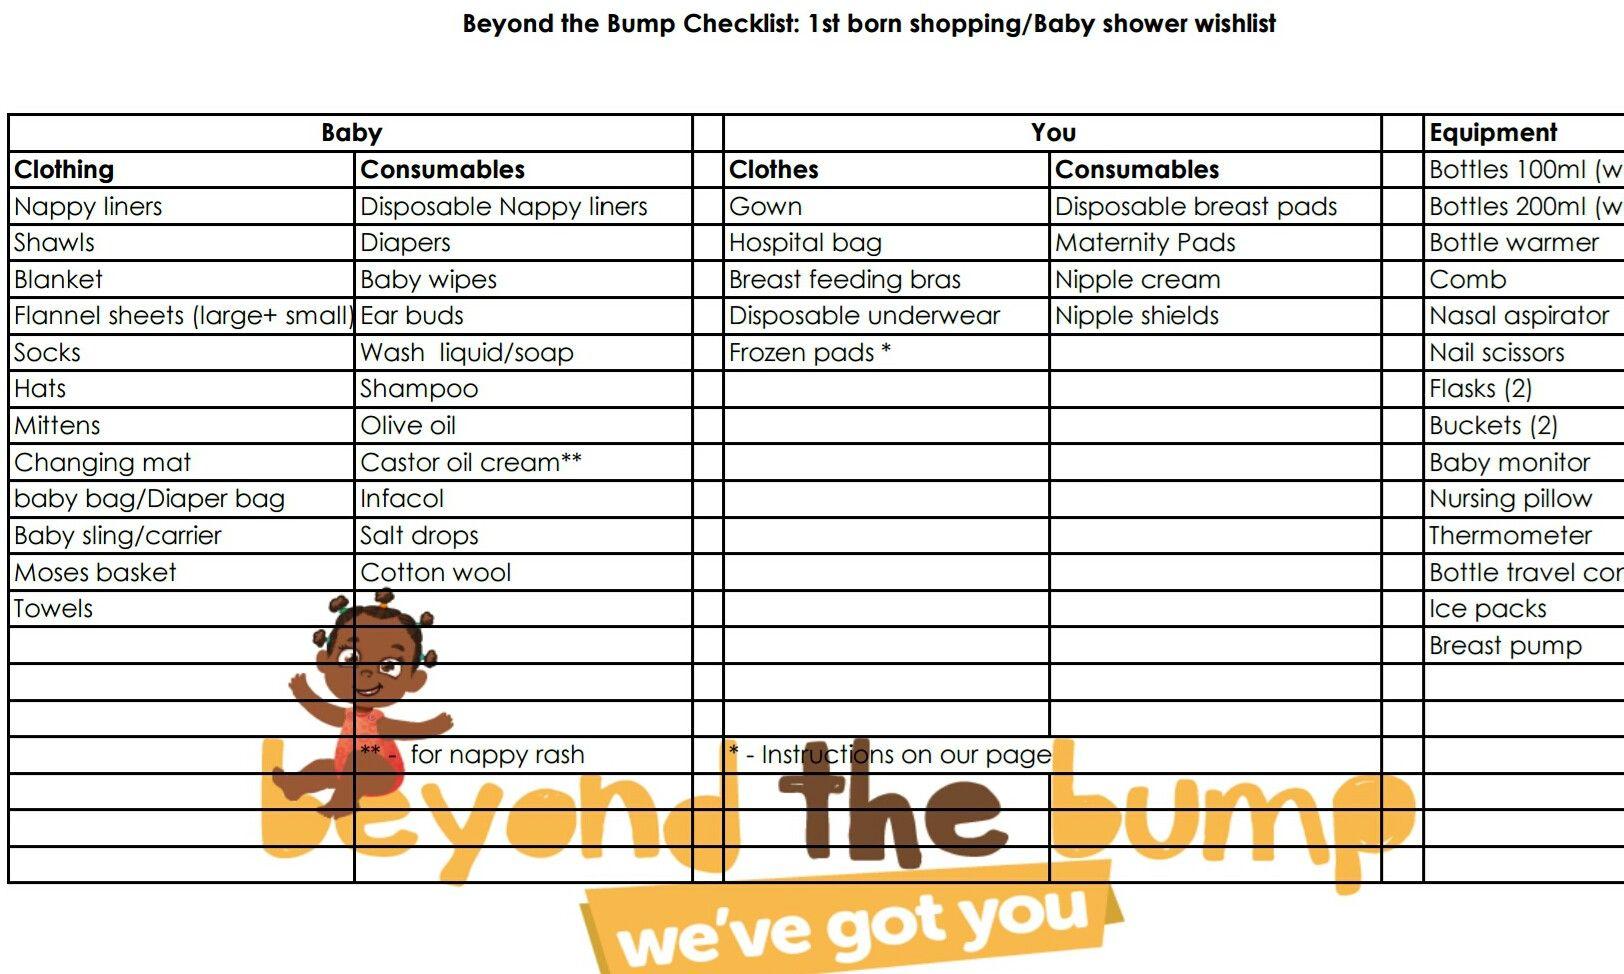 Baby Shower Checklist New Mom Checklist  Beyondthebumpke